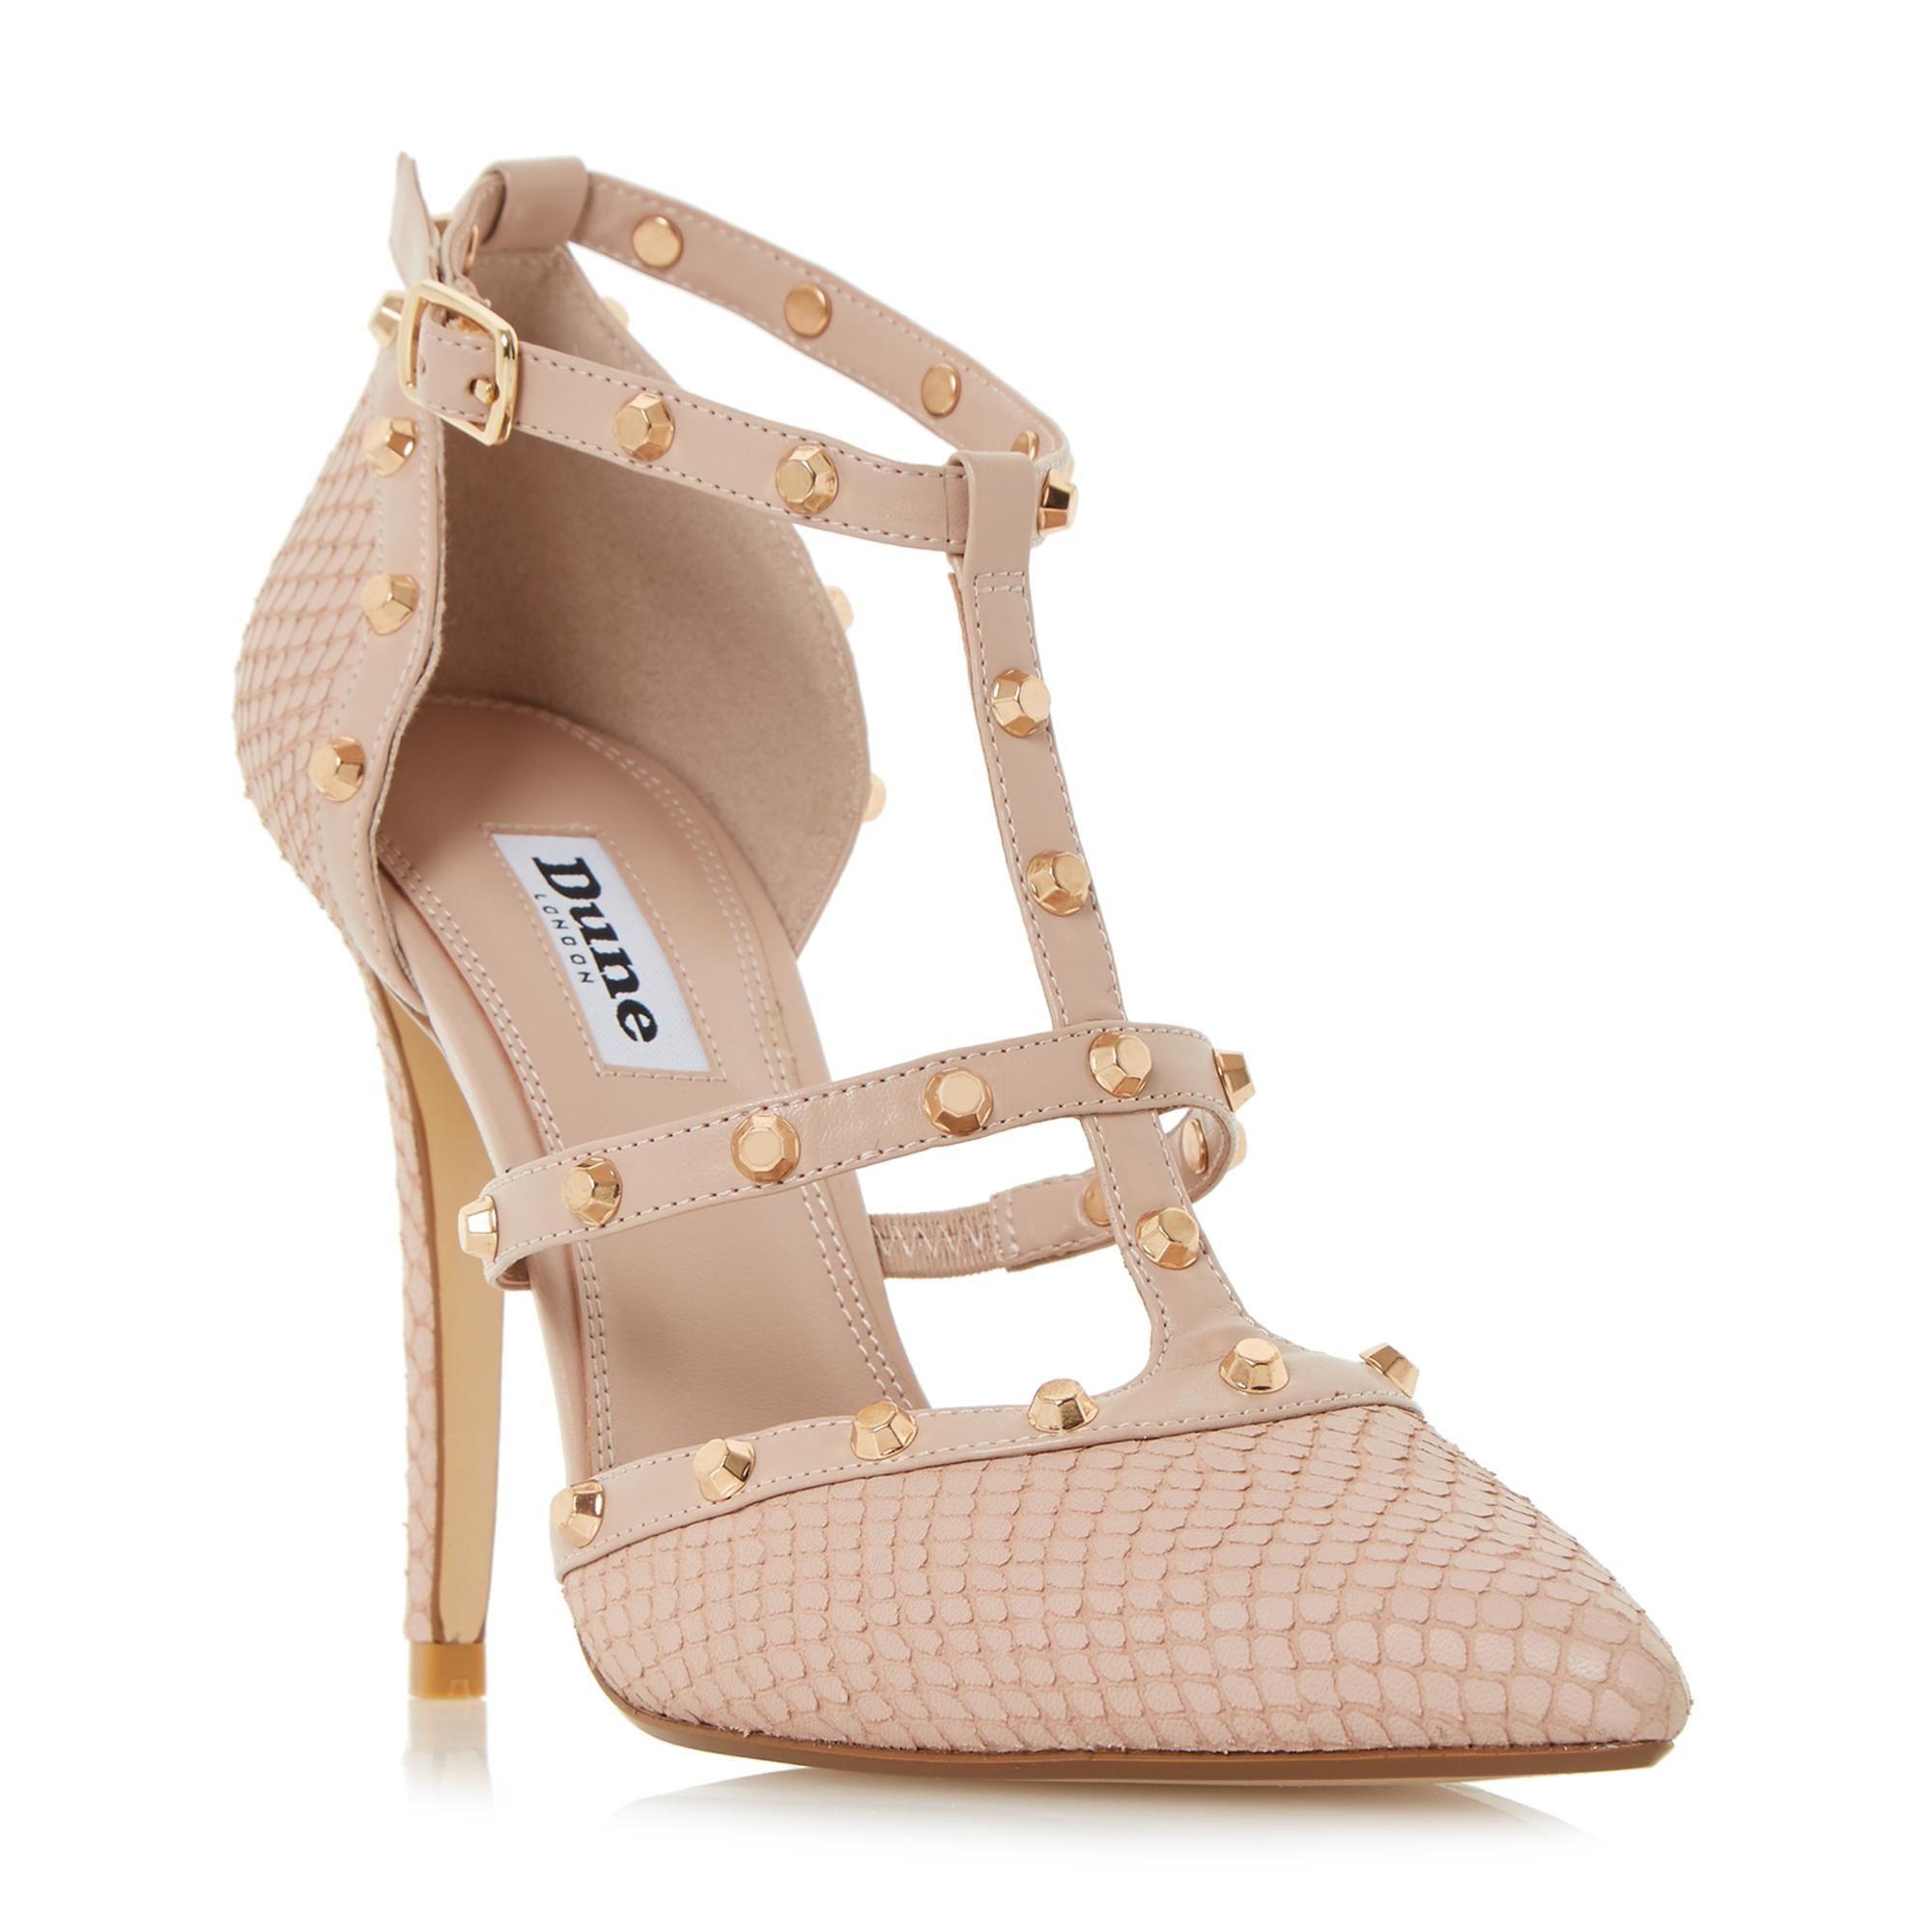 e3aa668bdff5a8 DUNE LADIES DAENERYS - Studded High Heel Pump - blush